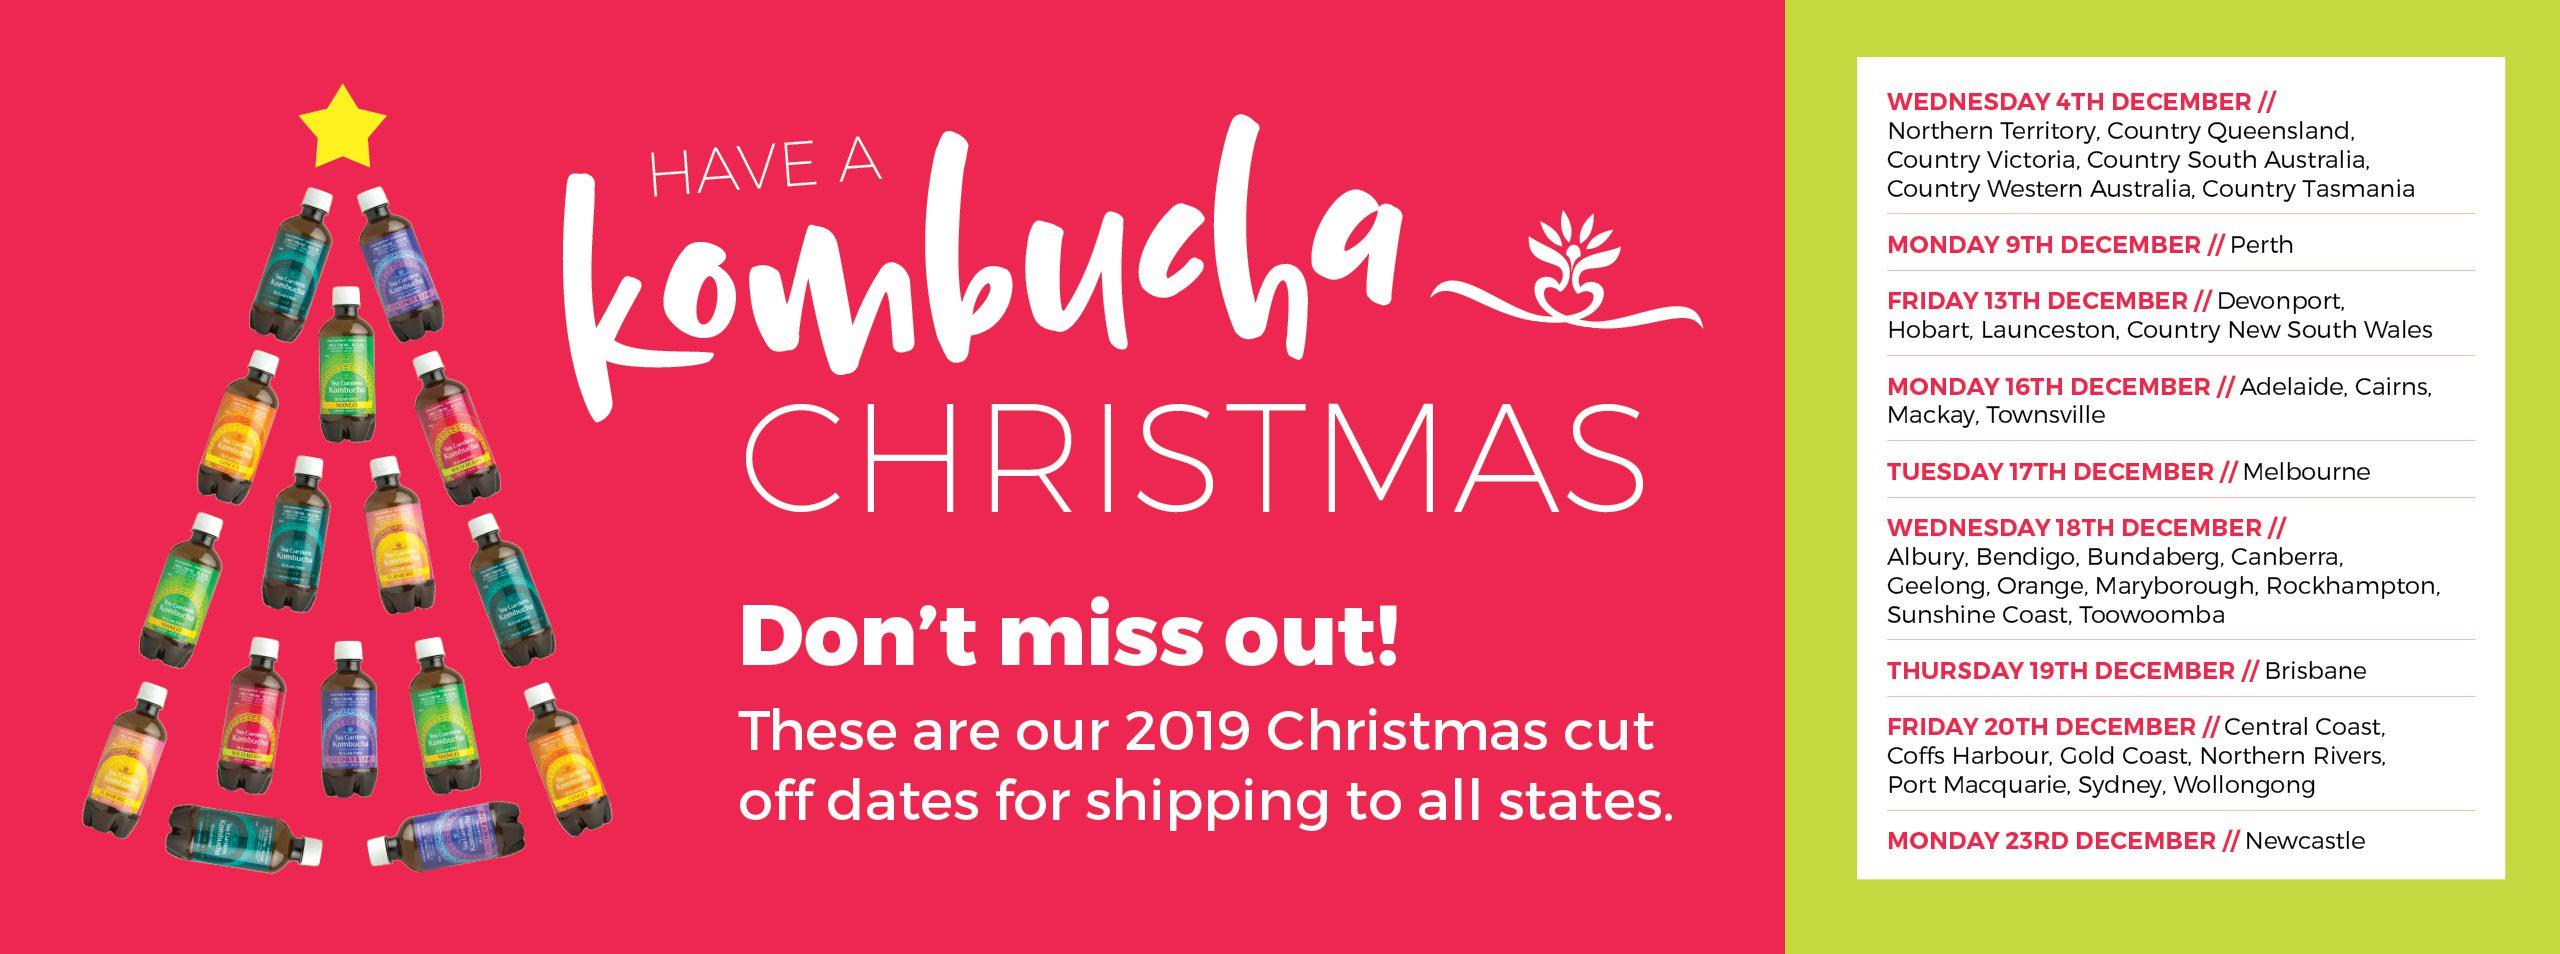 Tea Gardens Kombucha Christmas Shipping Details